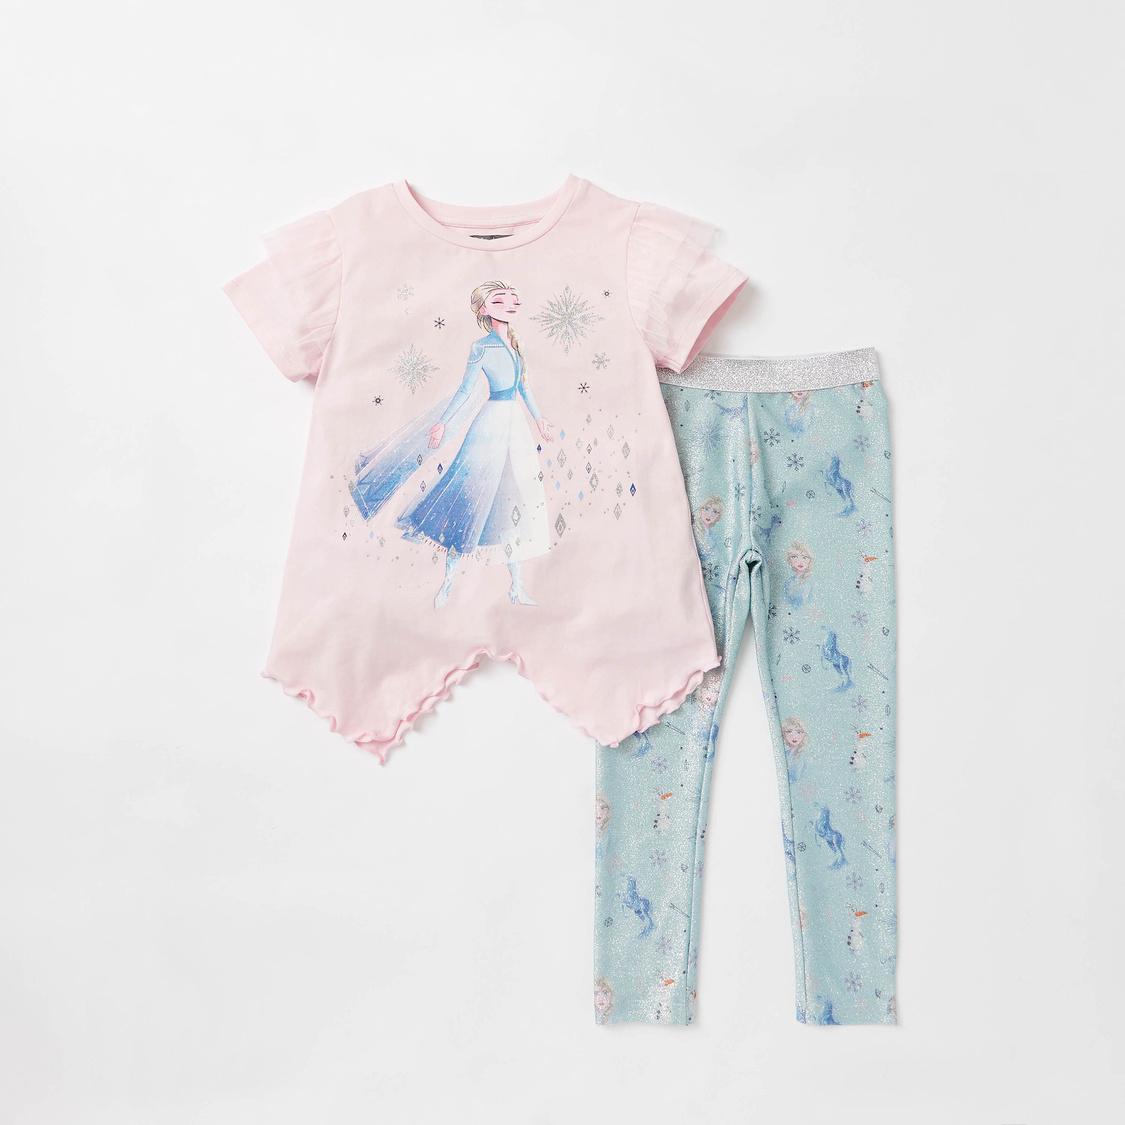 Frozen Embellished Round Neck T-shirt and Full Length Leggings Set